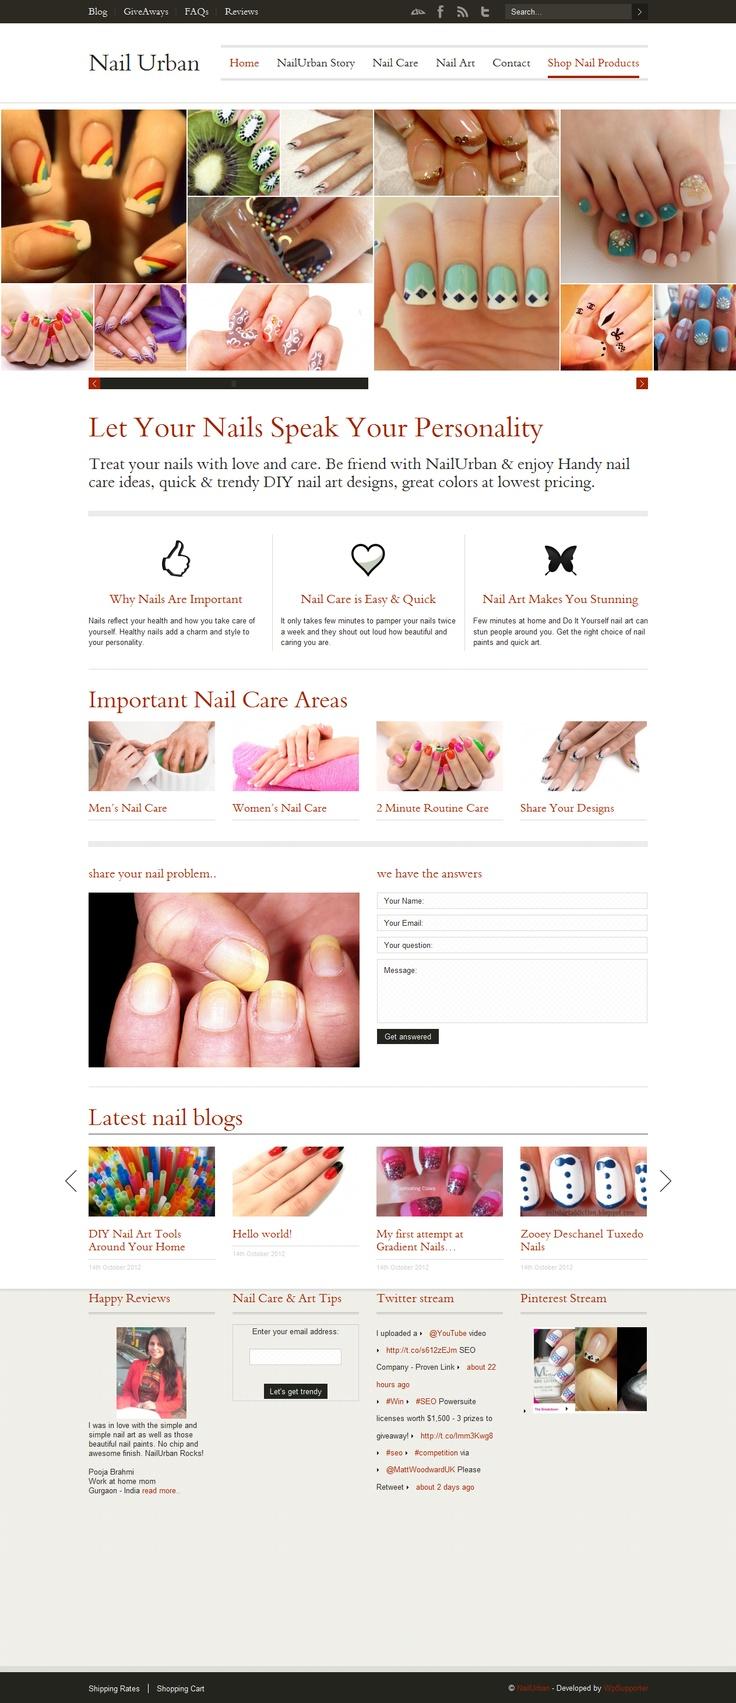 10 best Websites images on Pinterest | Website, Beauty hacks and ...